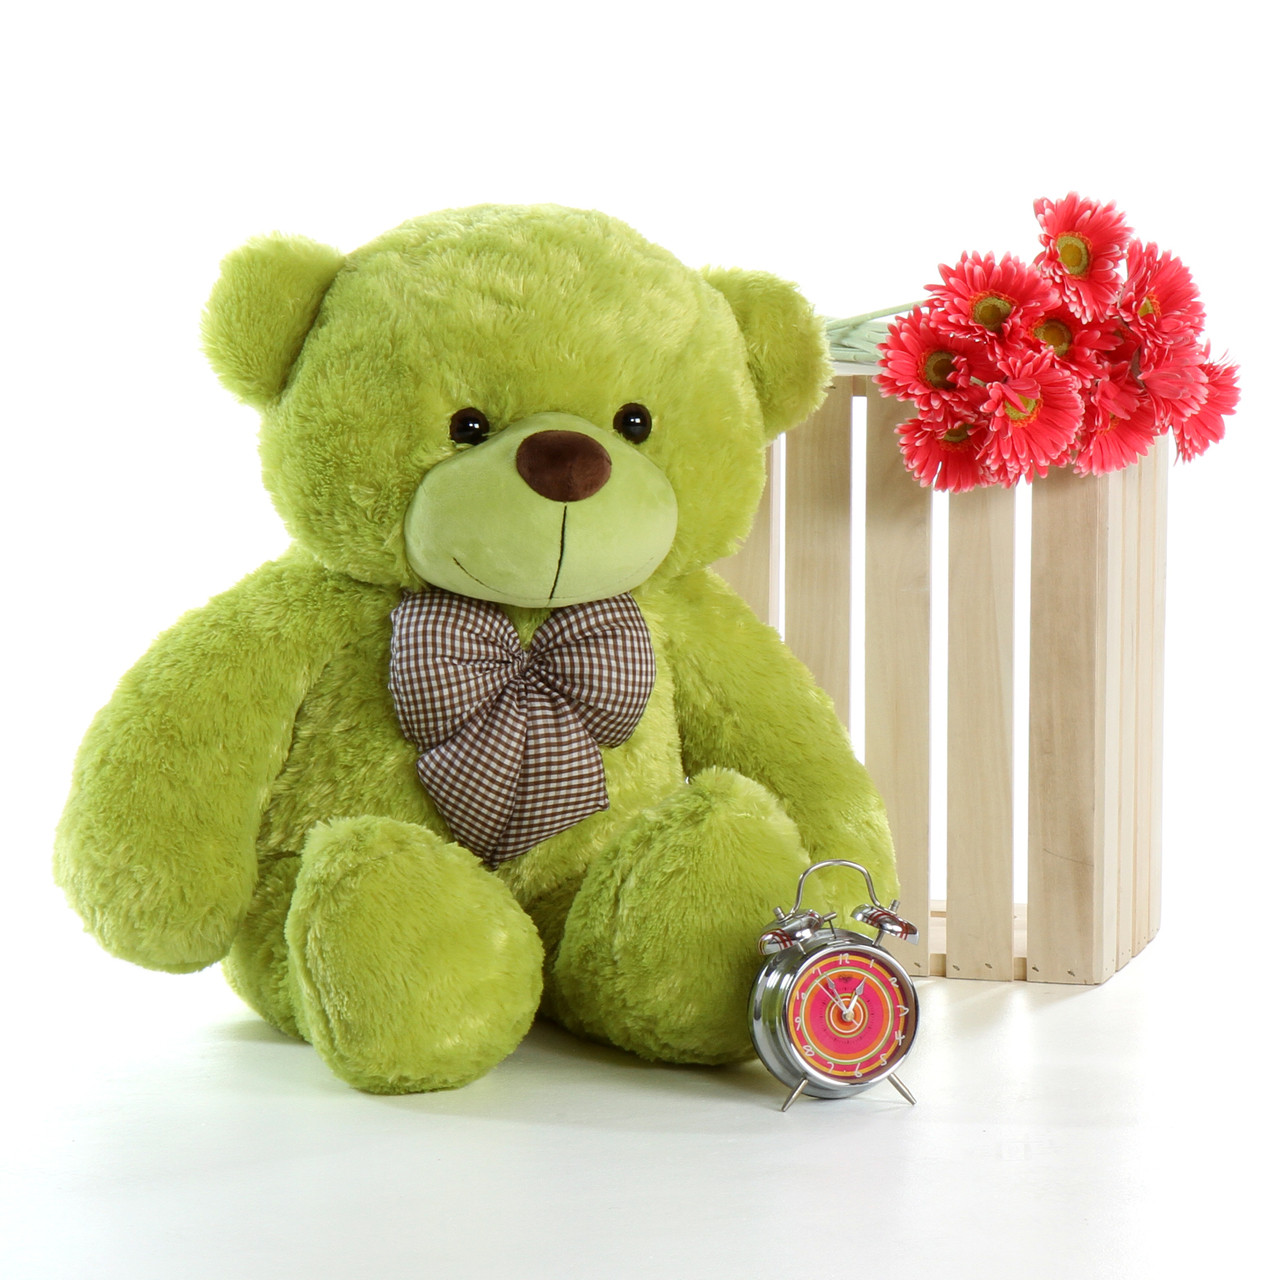 4ft Ace Cuddles Giant Teddy Lime Green Super Soft Bear